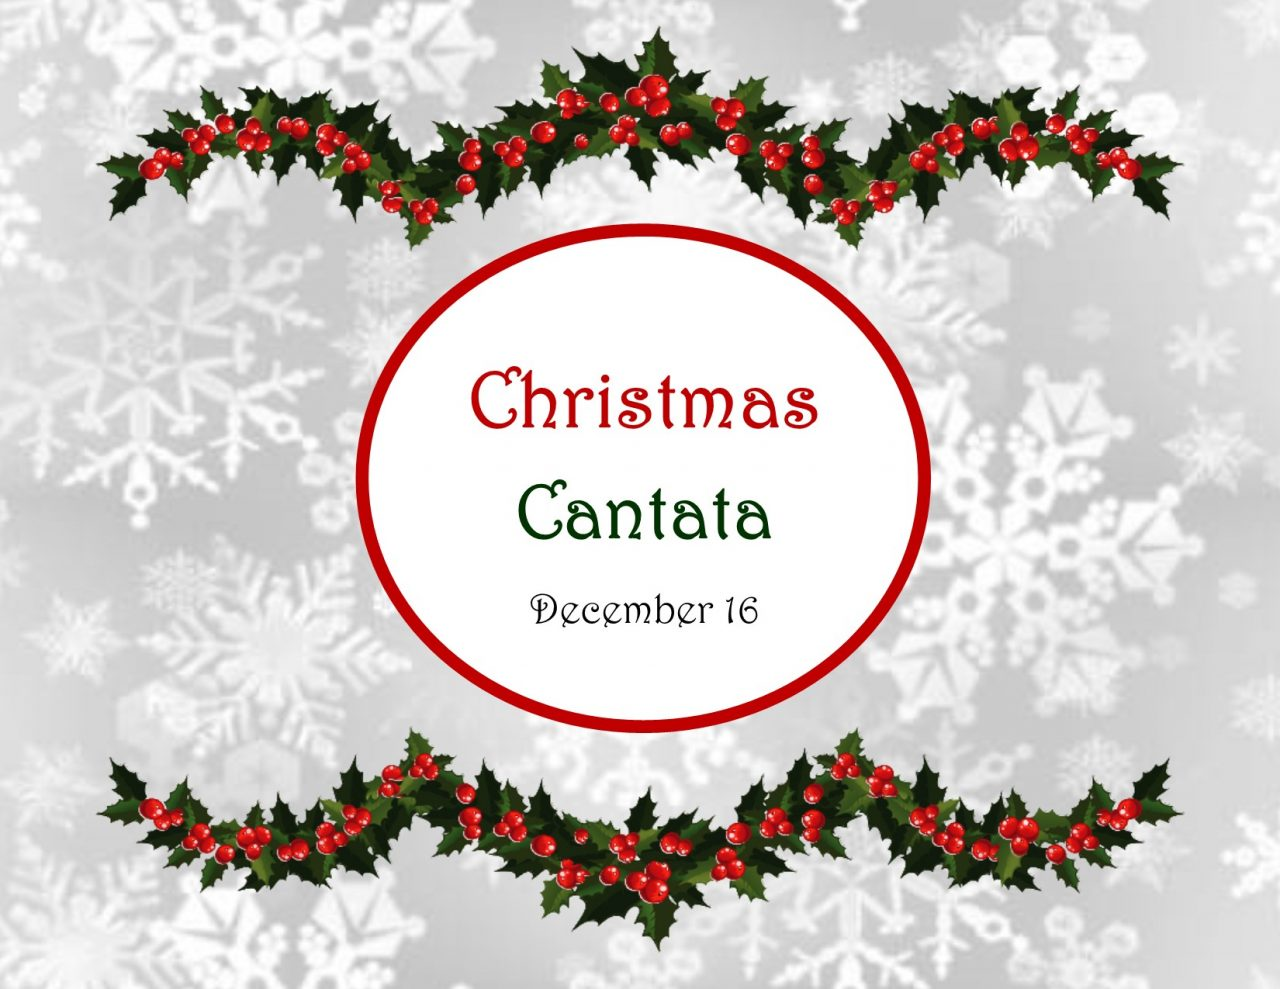 2018 Rosedale Baptist Church Christmas Cantata will be on Sunday, December 16!